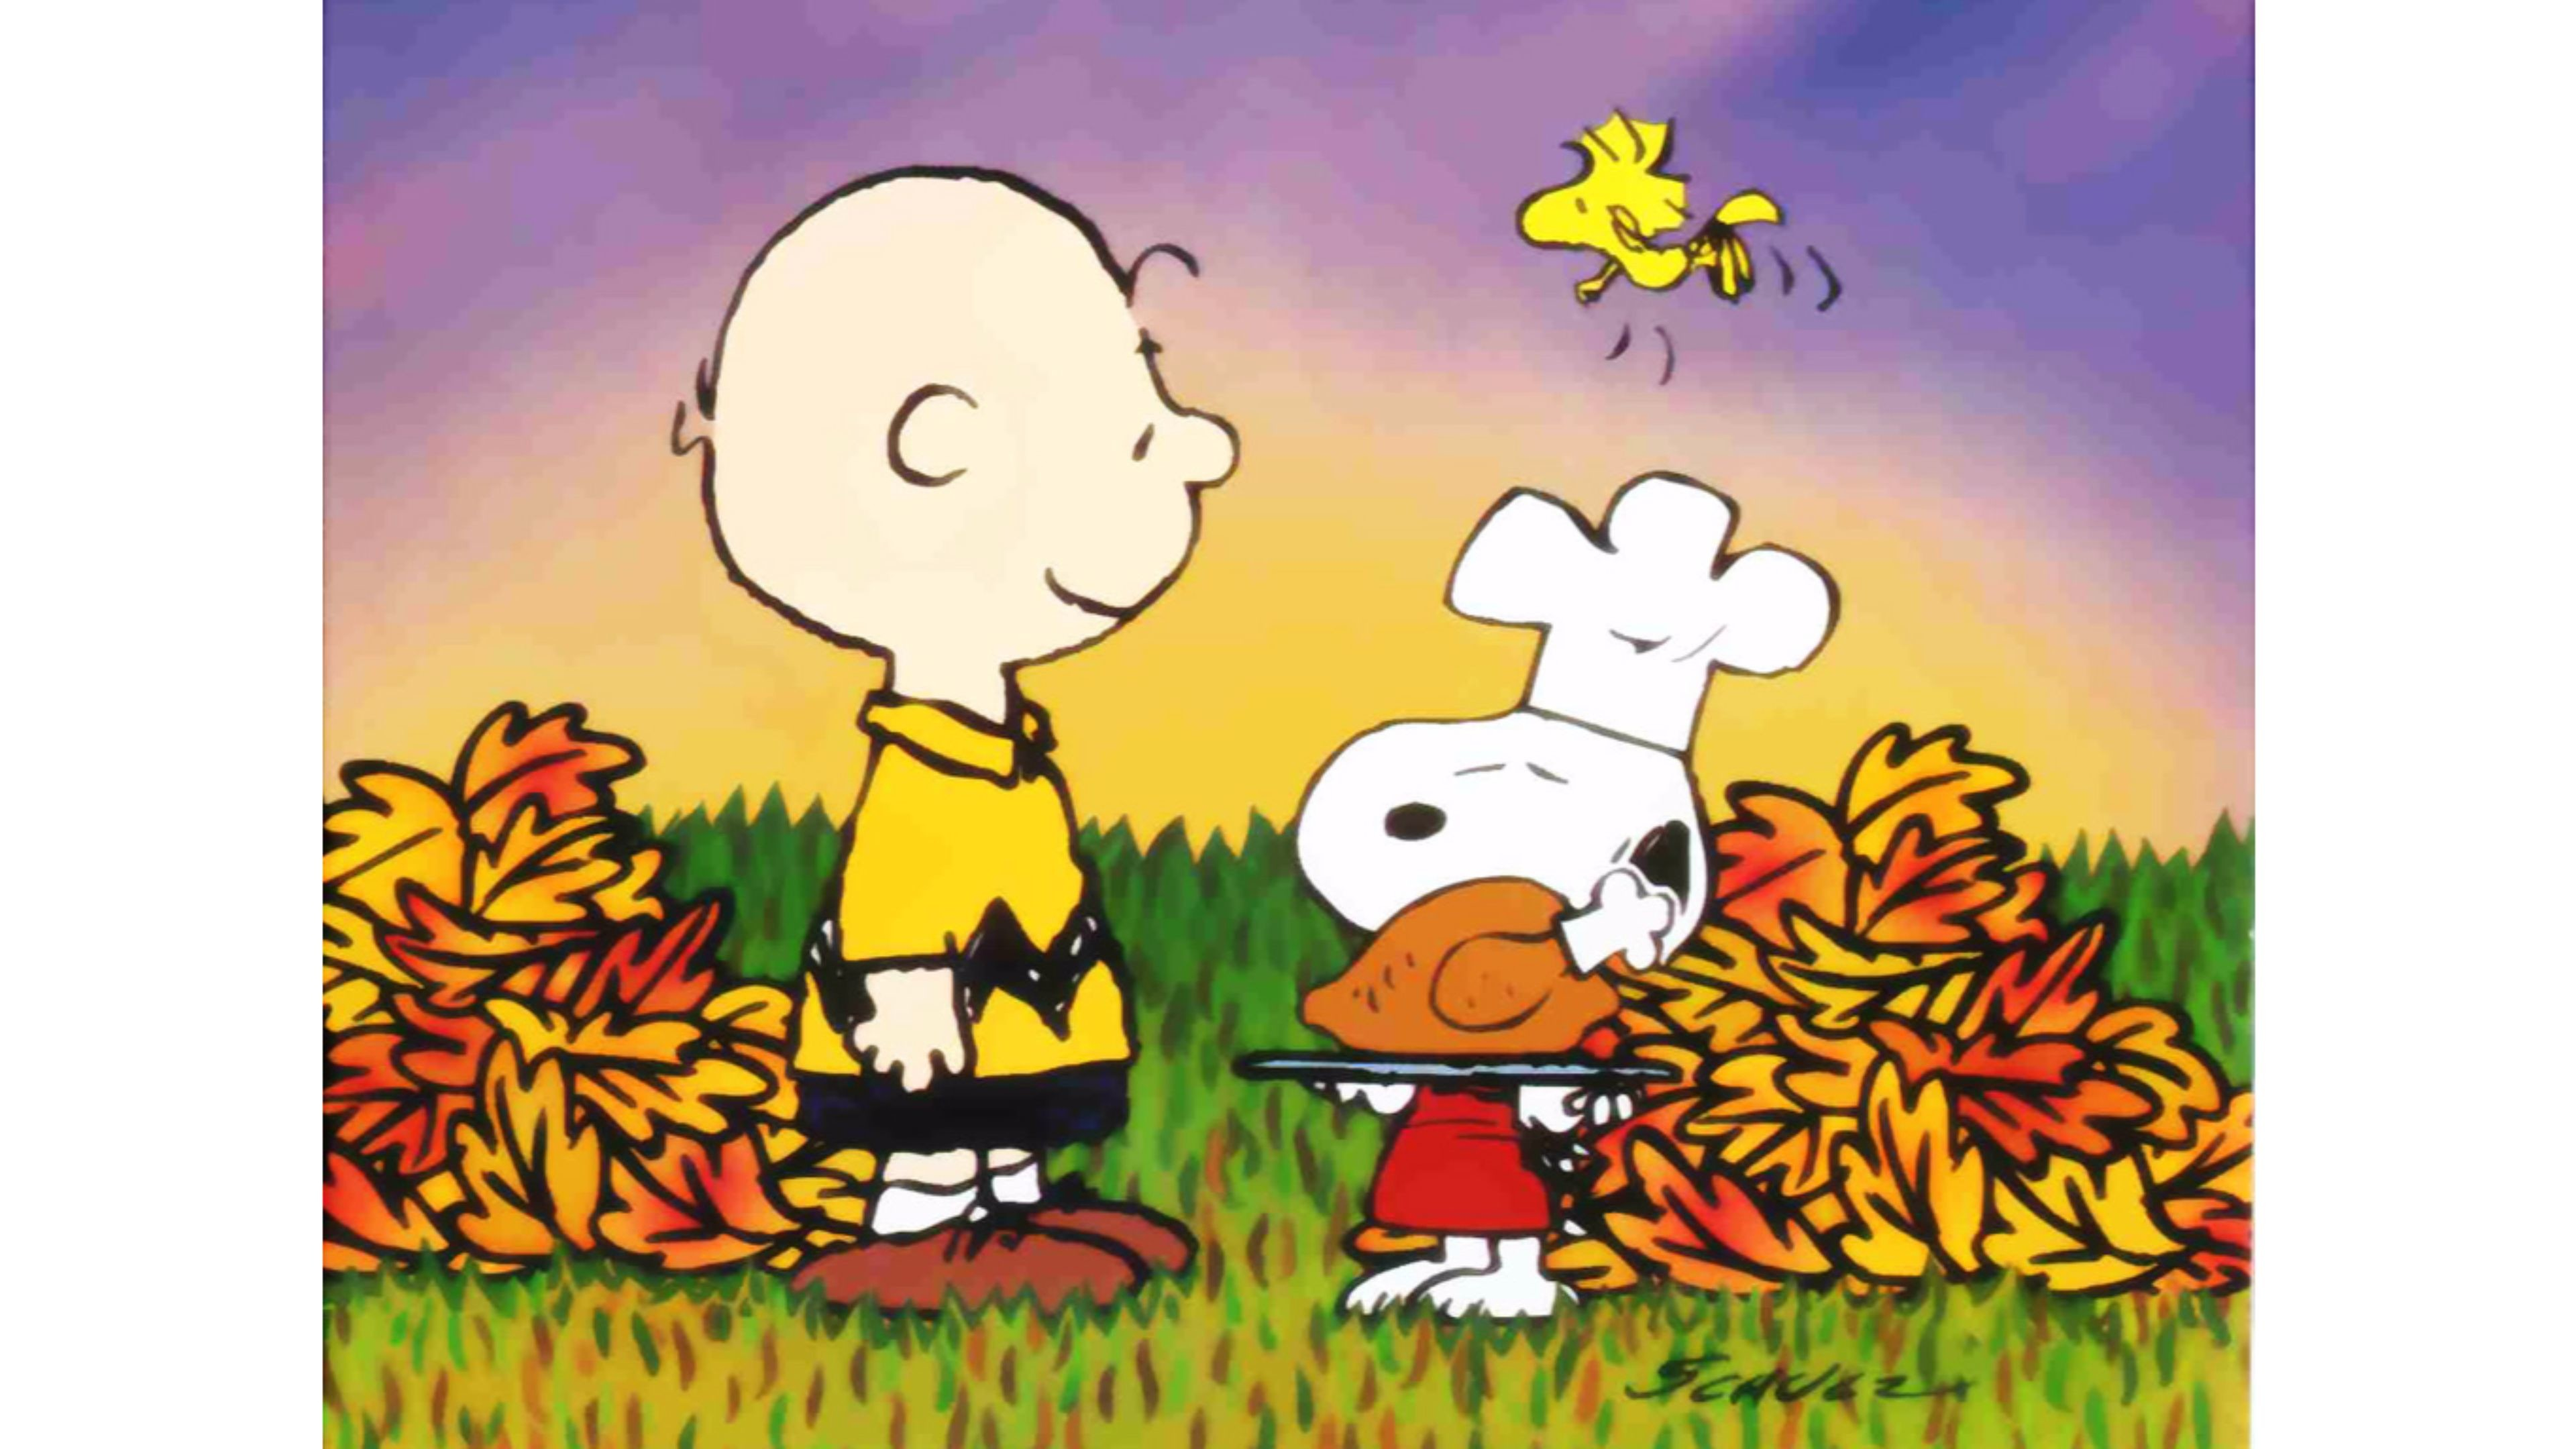 Charlie Brown Halloween Facebook Cover   Free Here. Charlie Brown Halloween  Facebook Cover Free Here